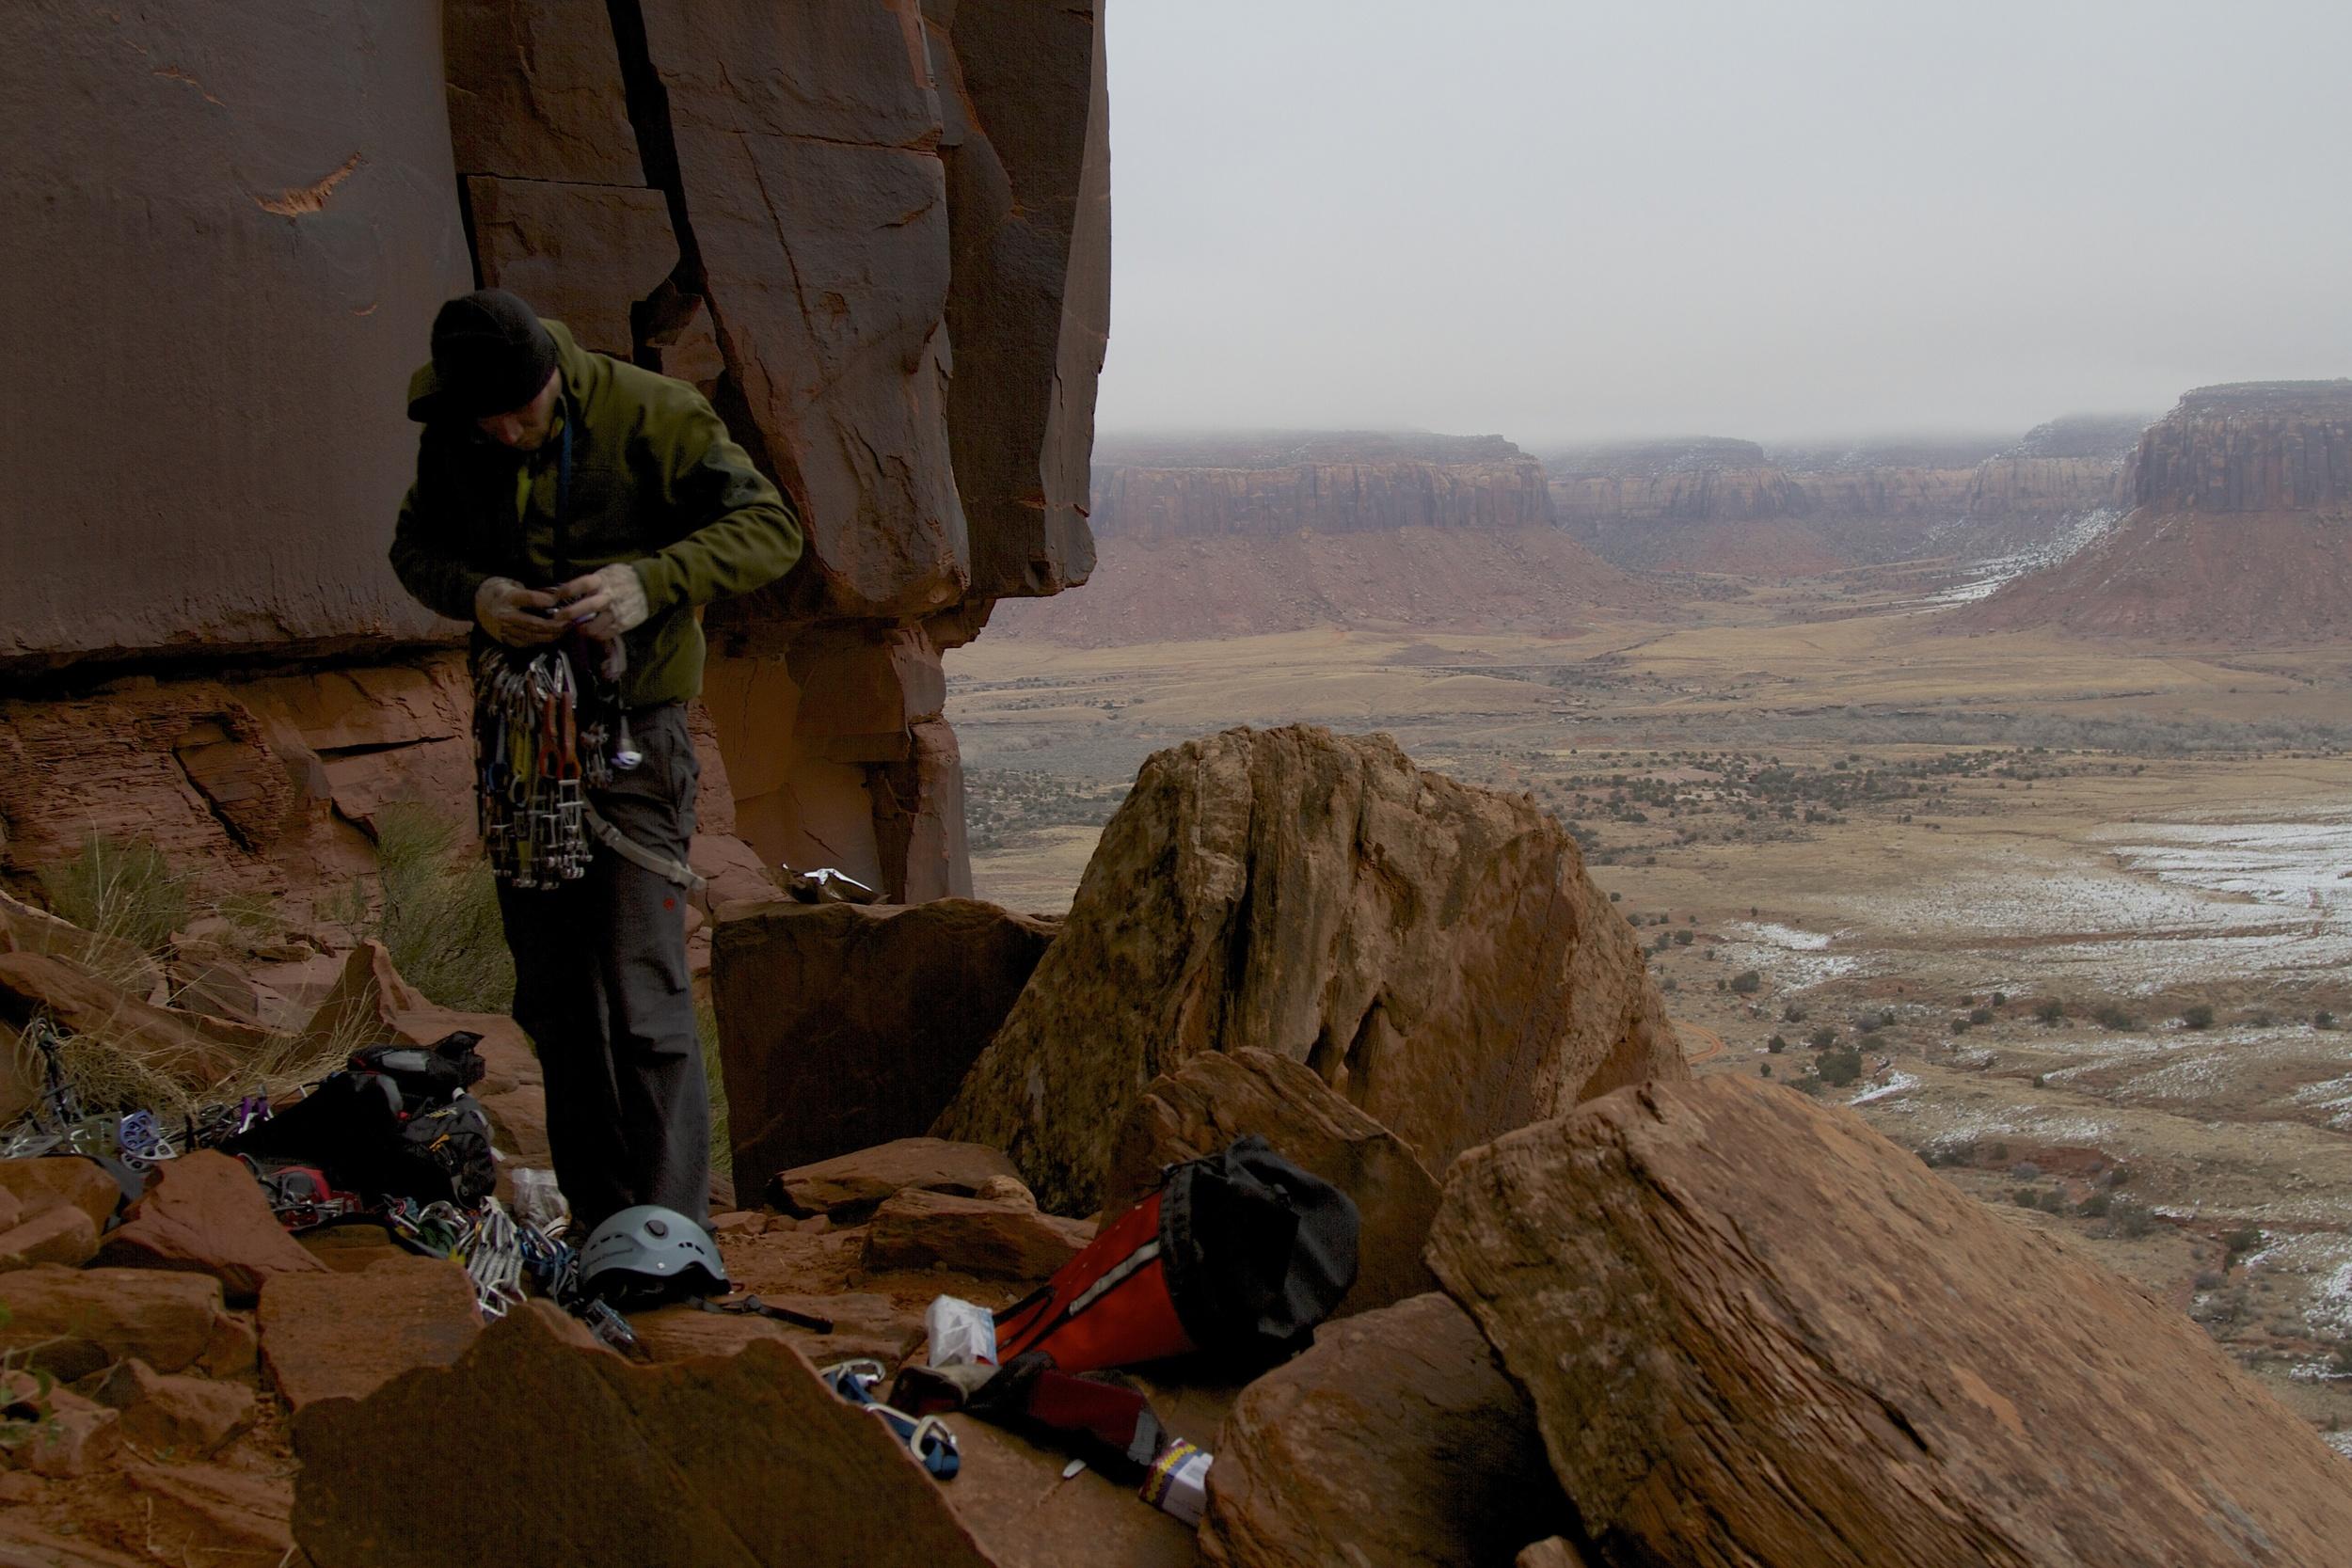 Indian Creek, a world class sandstone crack climbing area.Photo credit: flickr, Jonathan Fox